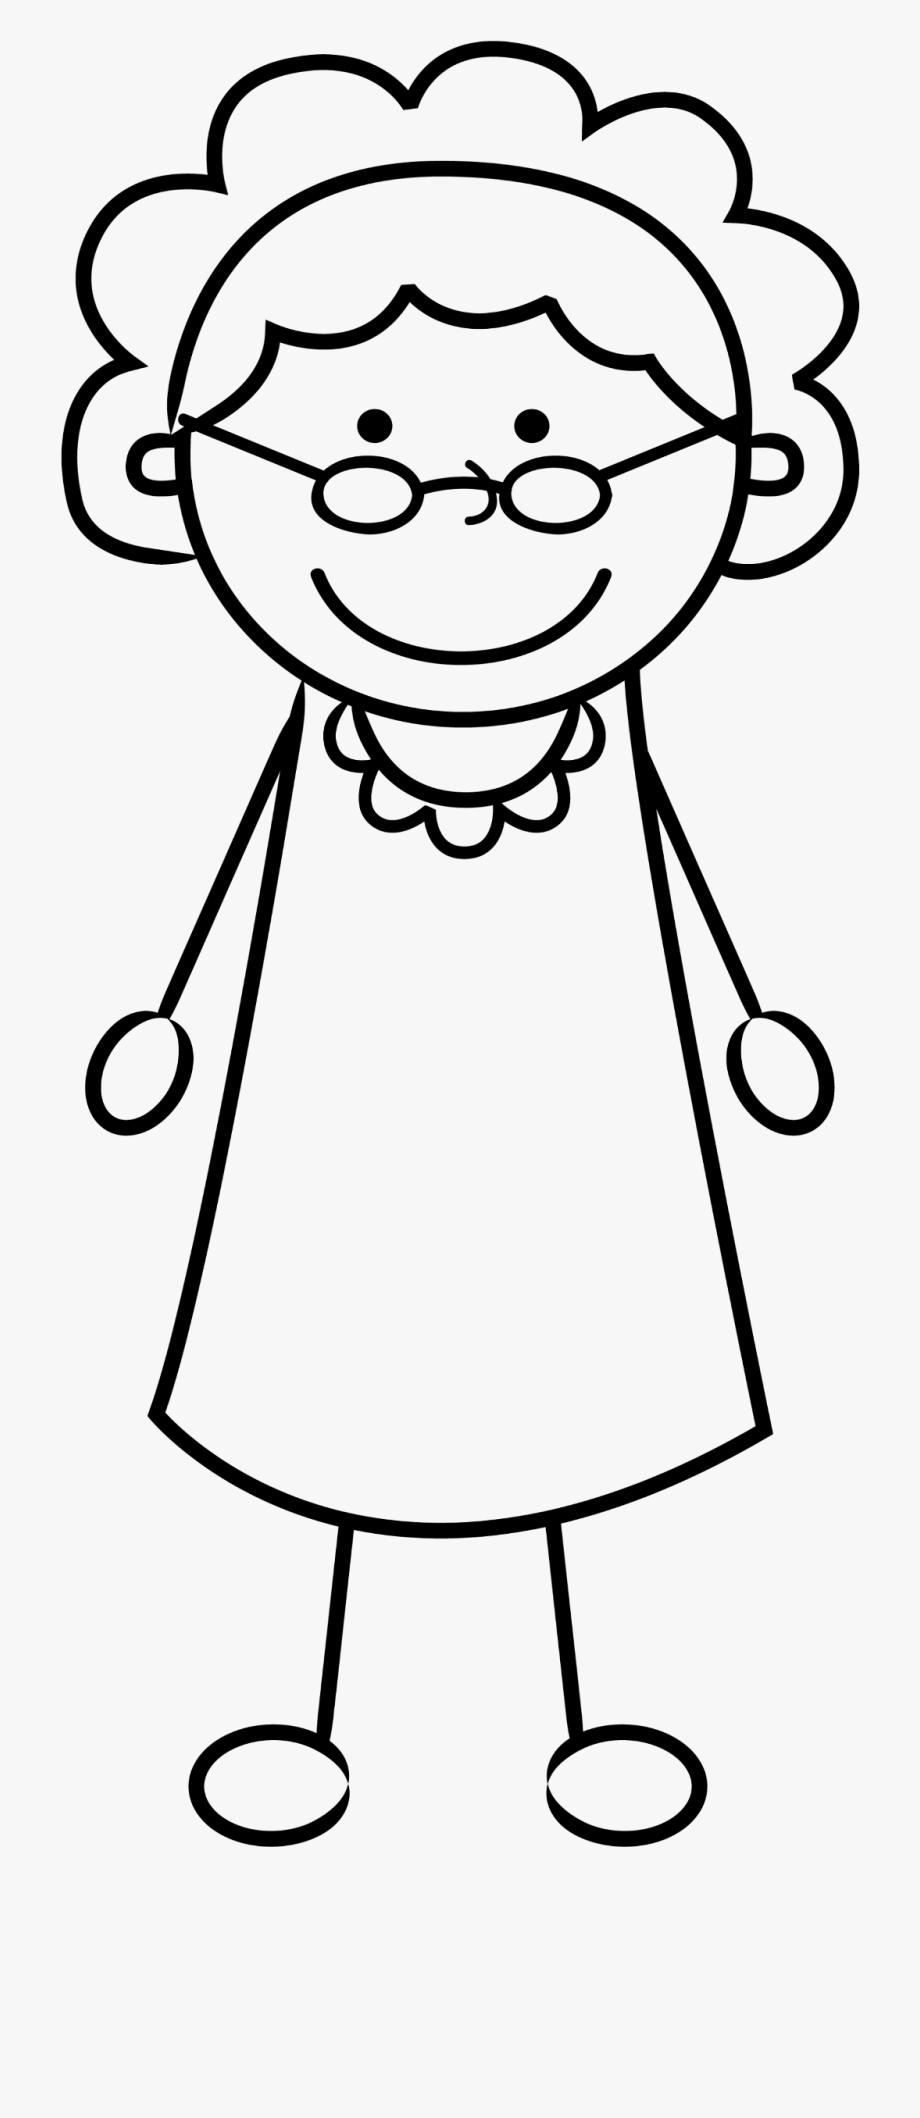 Grandmother clipart black and white. Freetoedit stickman grandma female